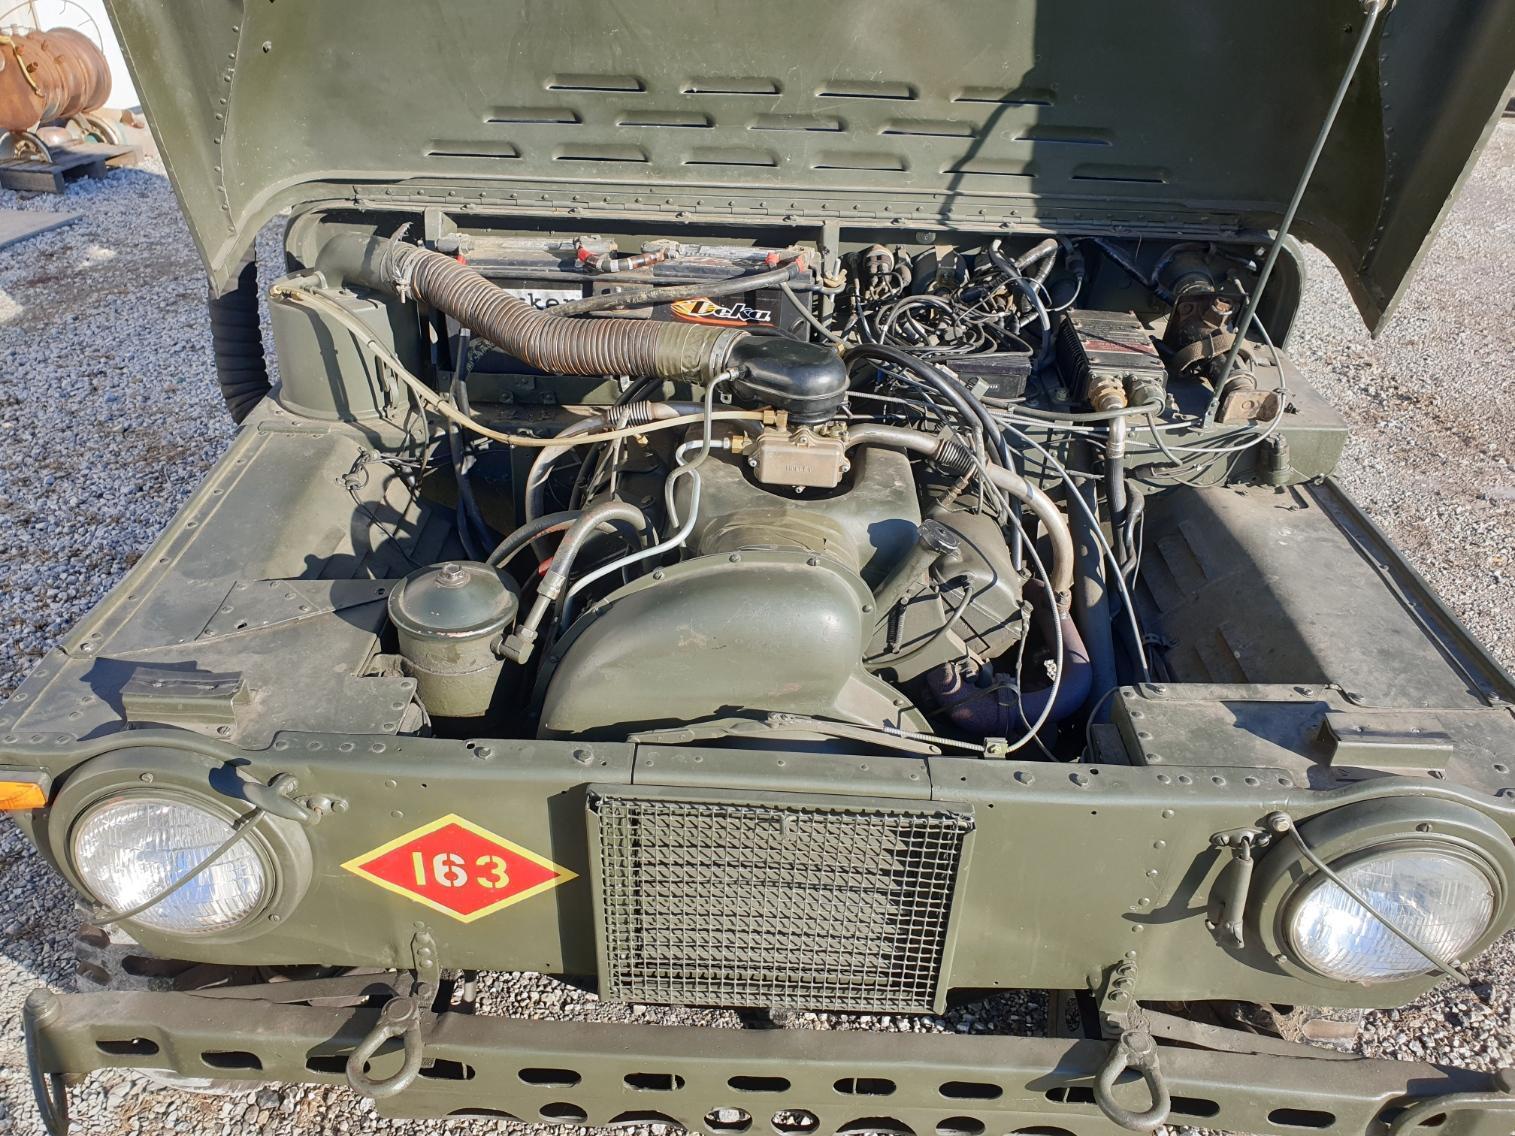 AMC M442A1 Mighty Mite engine bay